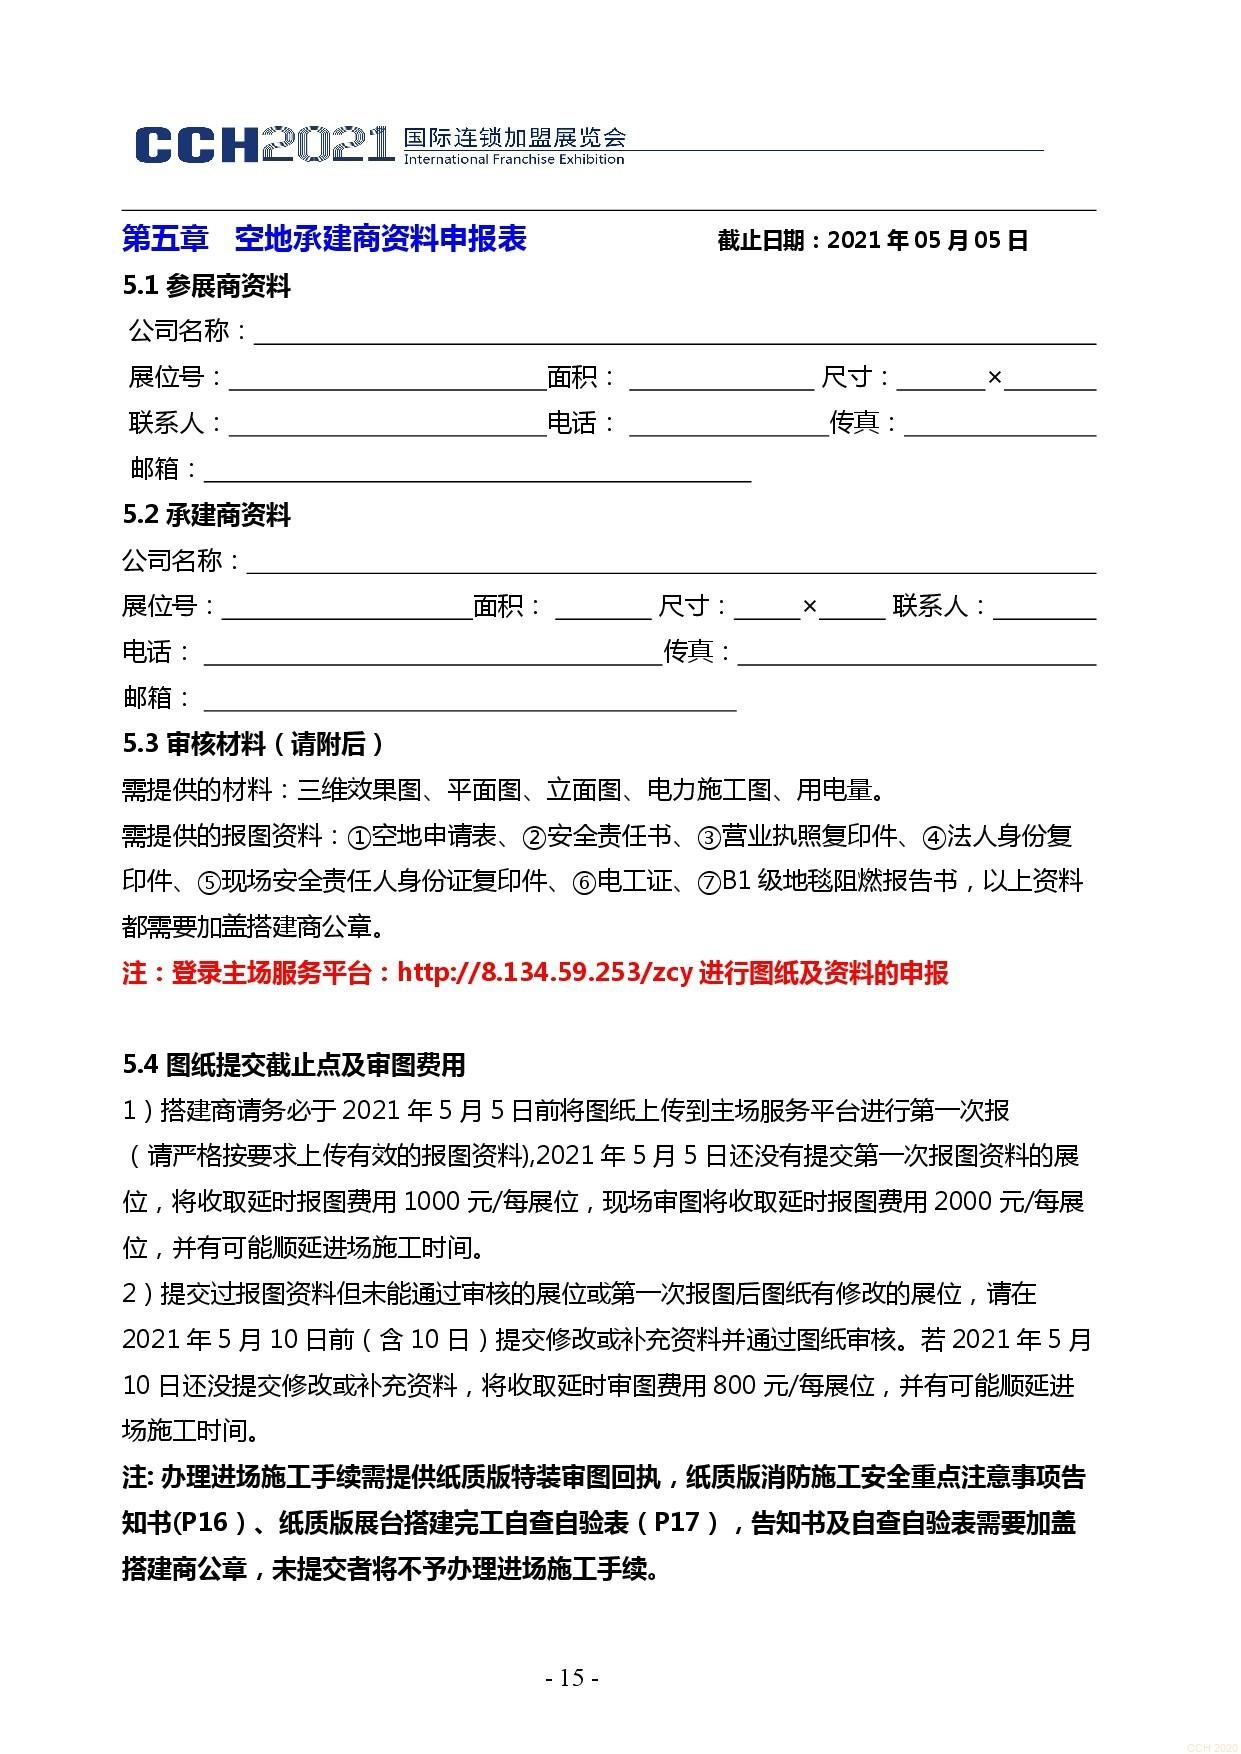 0416CCH深圳展参展商手册4.16-015.jpg